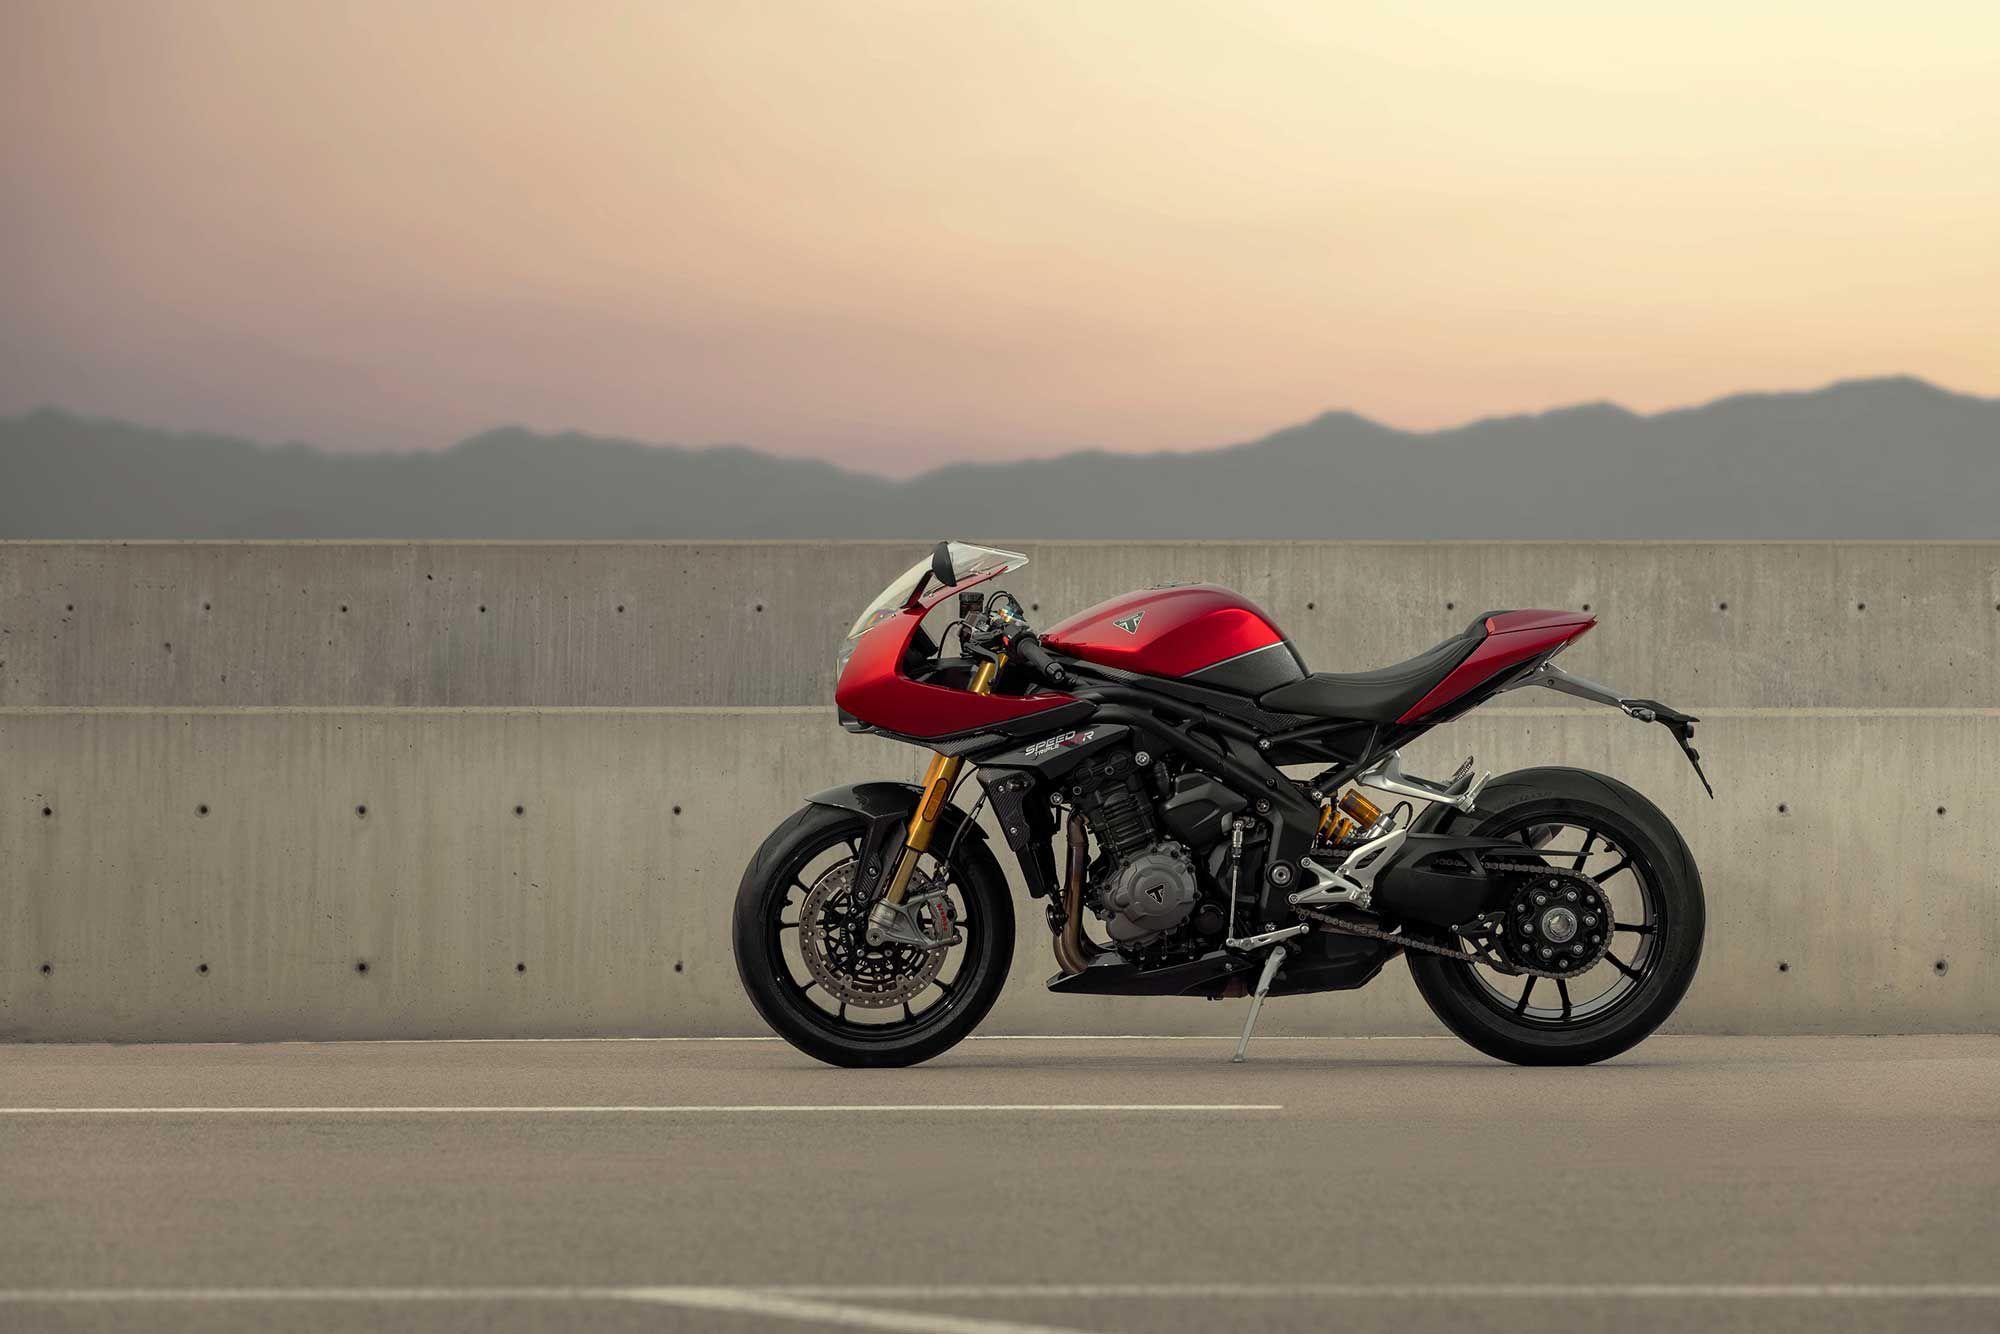 Meet the new Triumph Speed Triple 1200 RR.